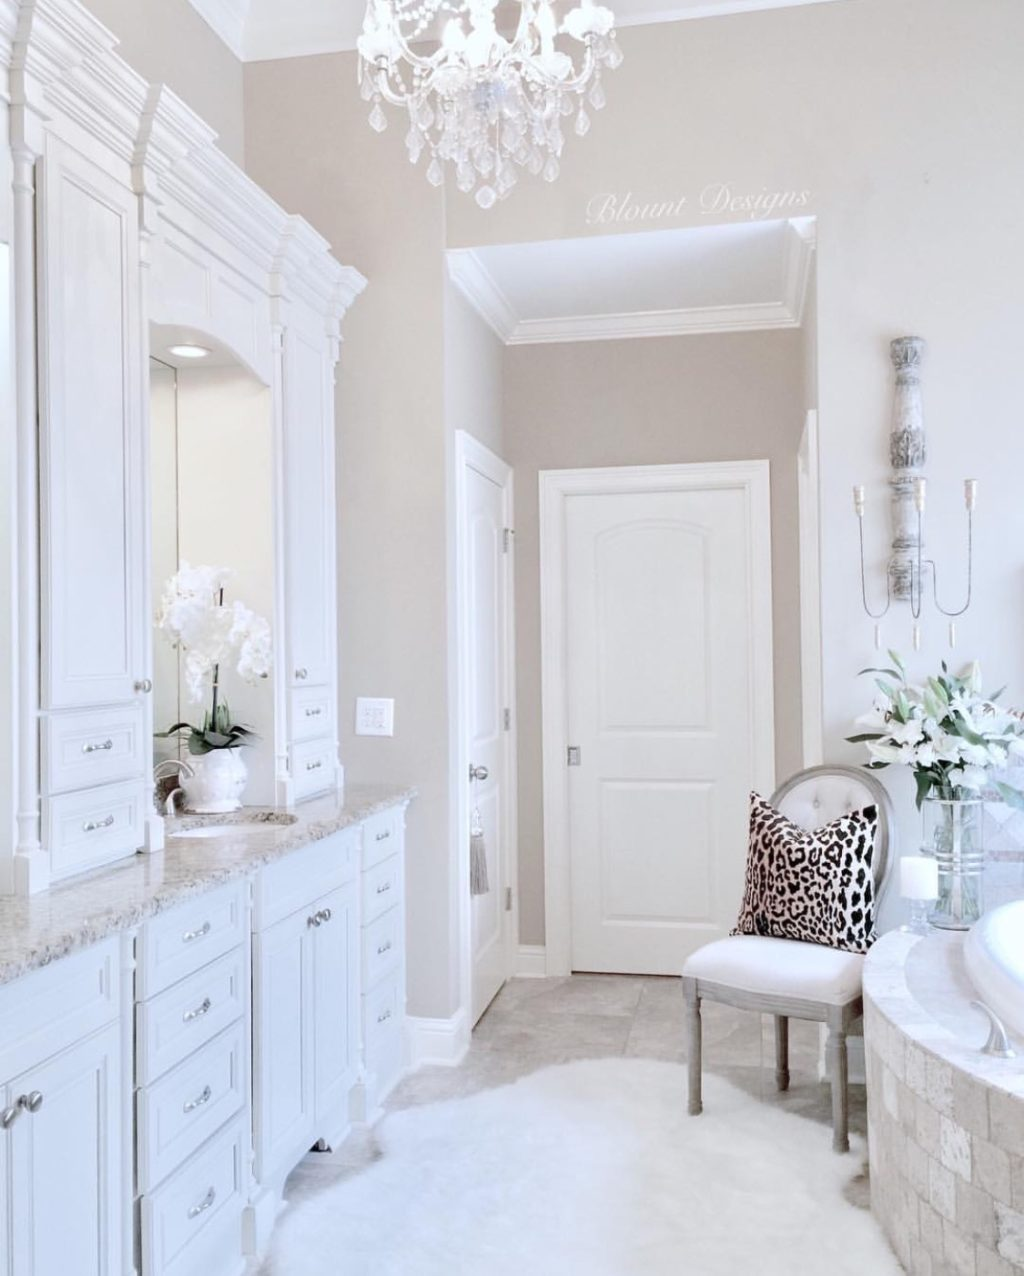 Bright White Home of Deborah Blount